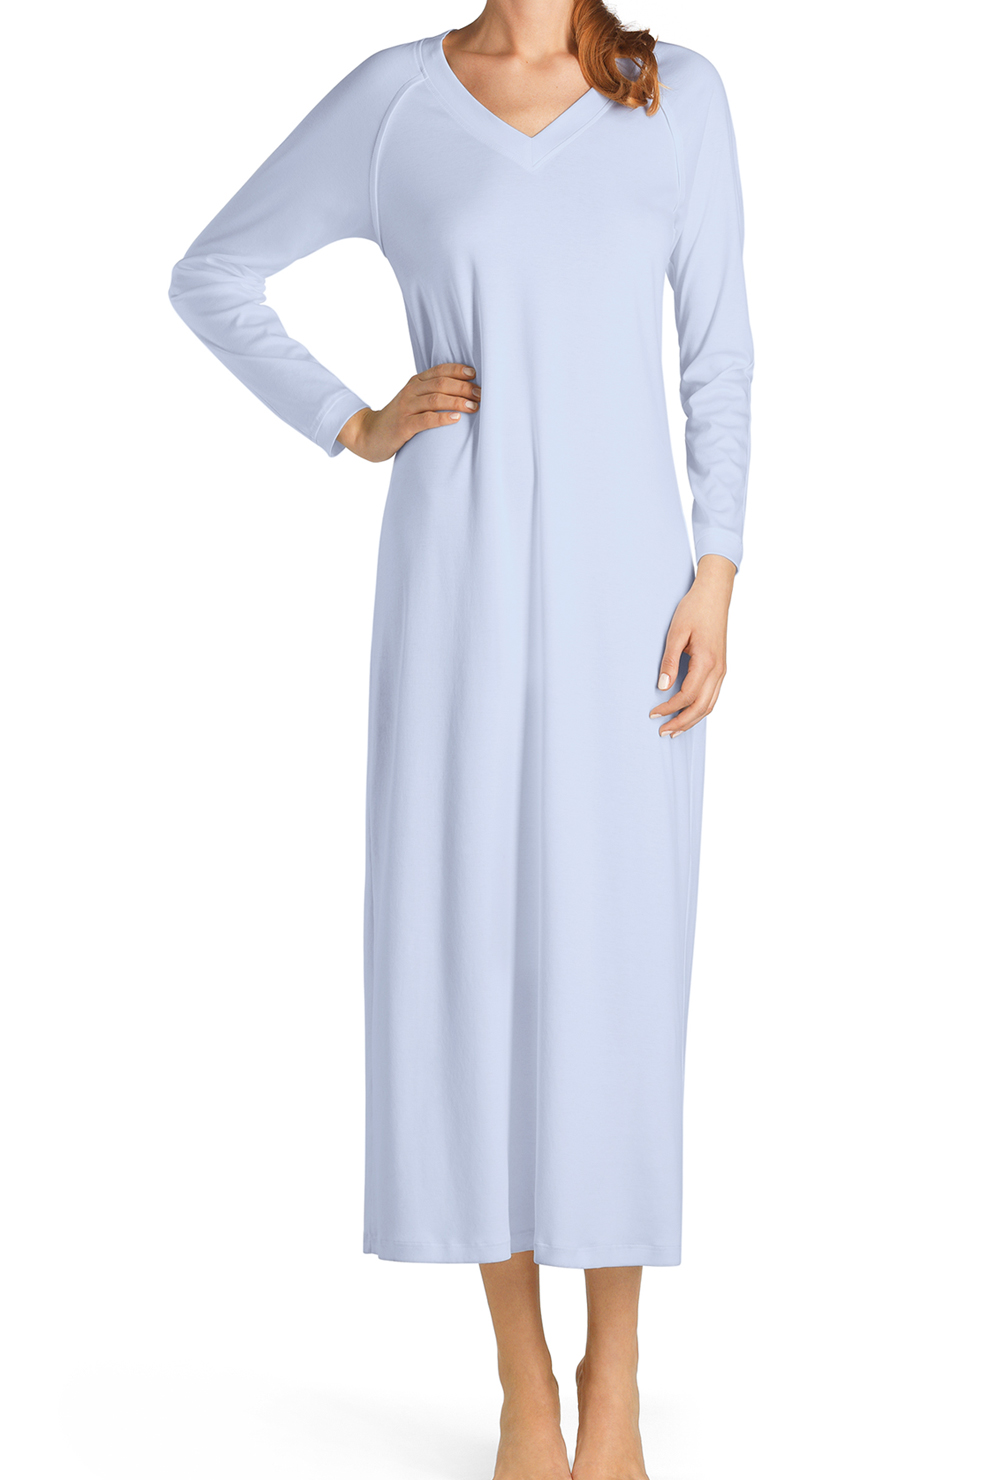 quality design 183a3 5ea41 Damen Nachthemd langarm